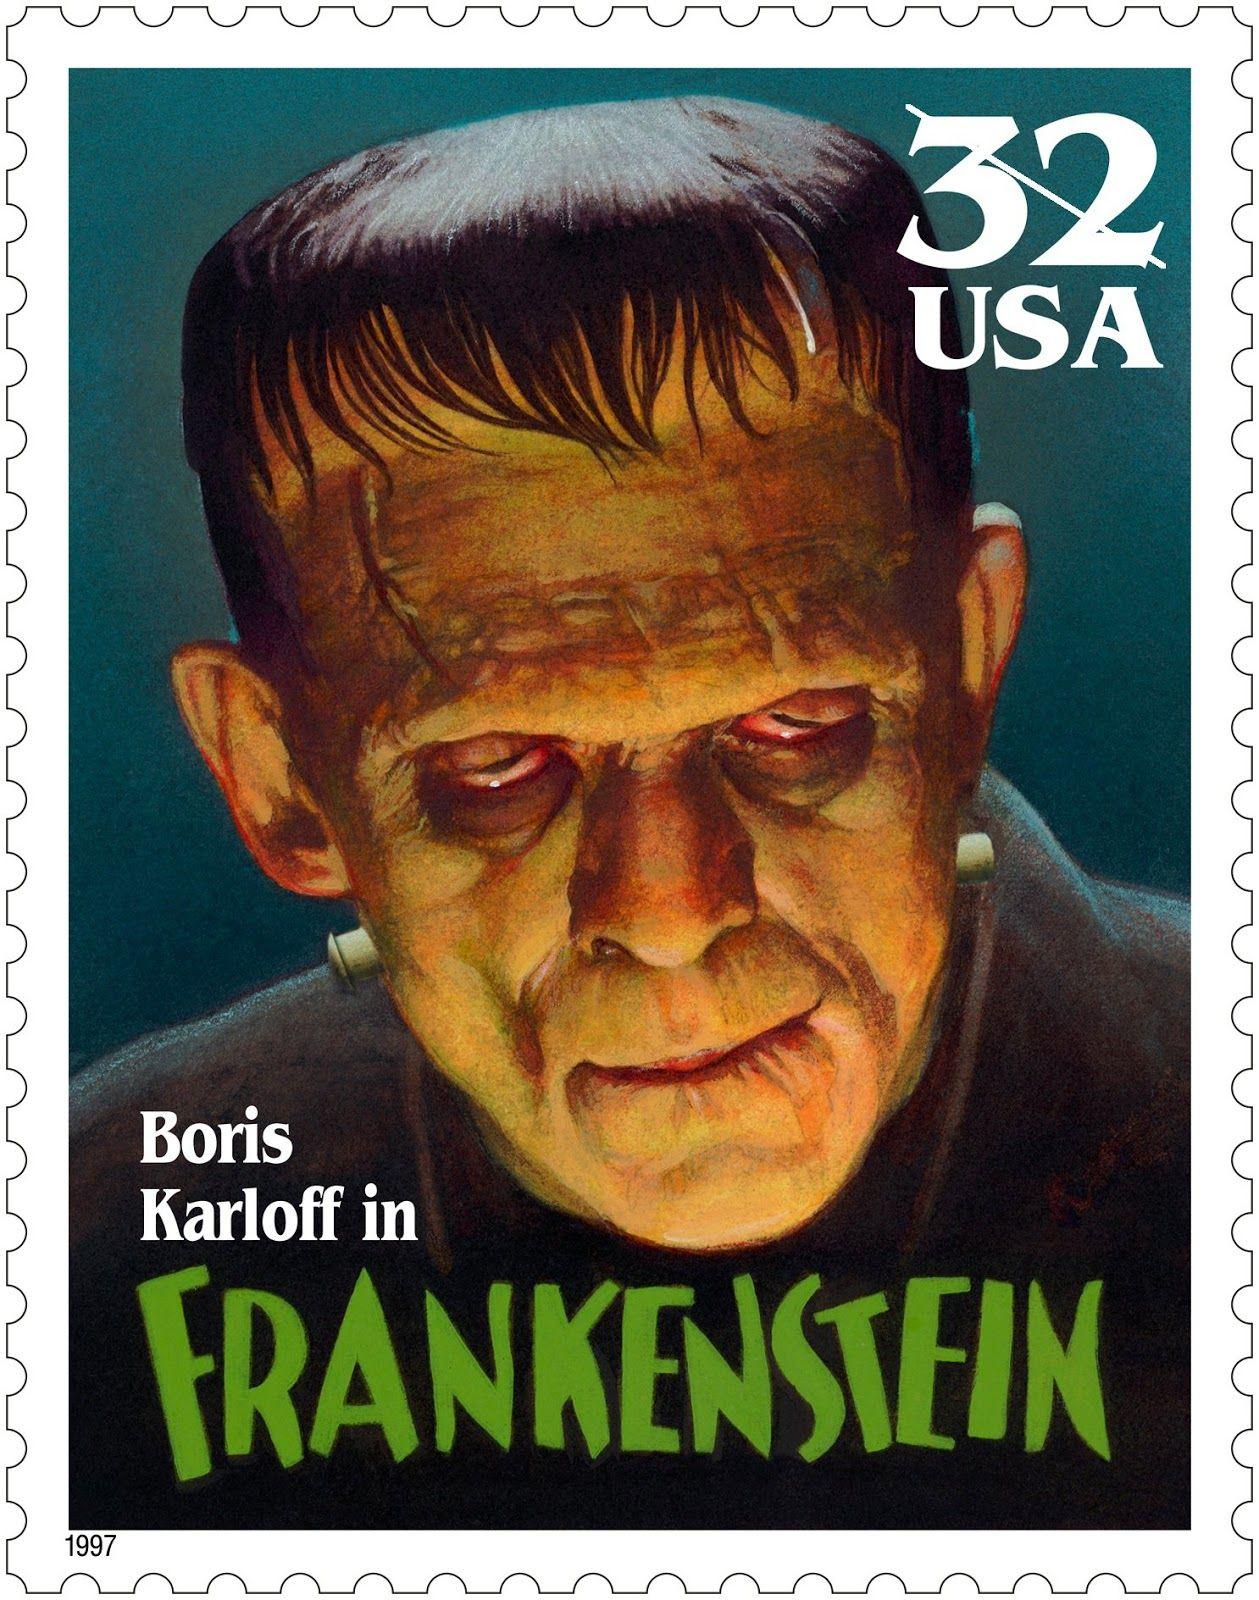 Origins of Frankenstein's creature's evil?